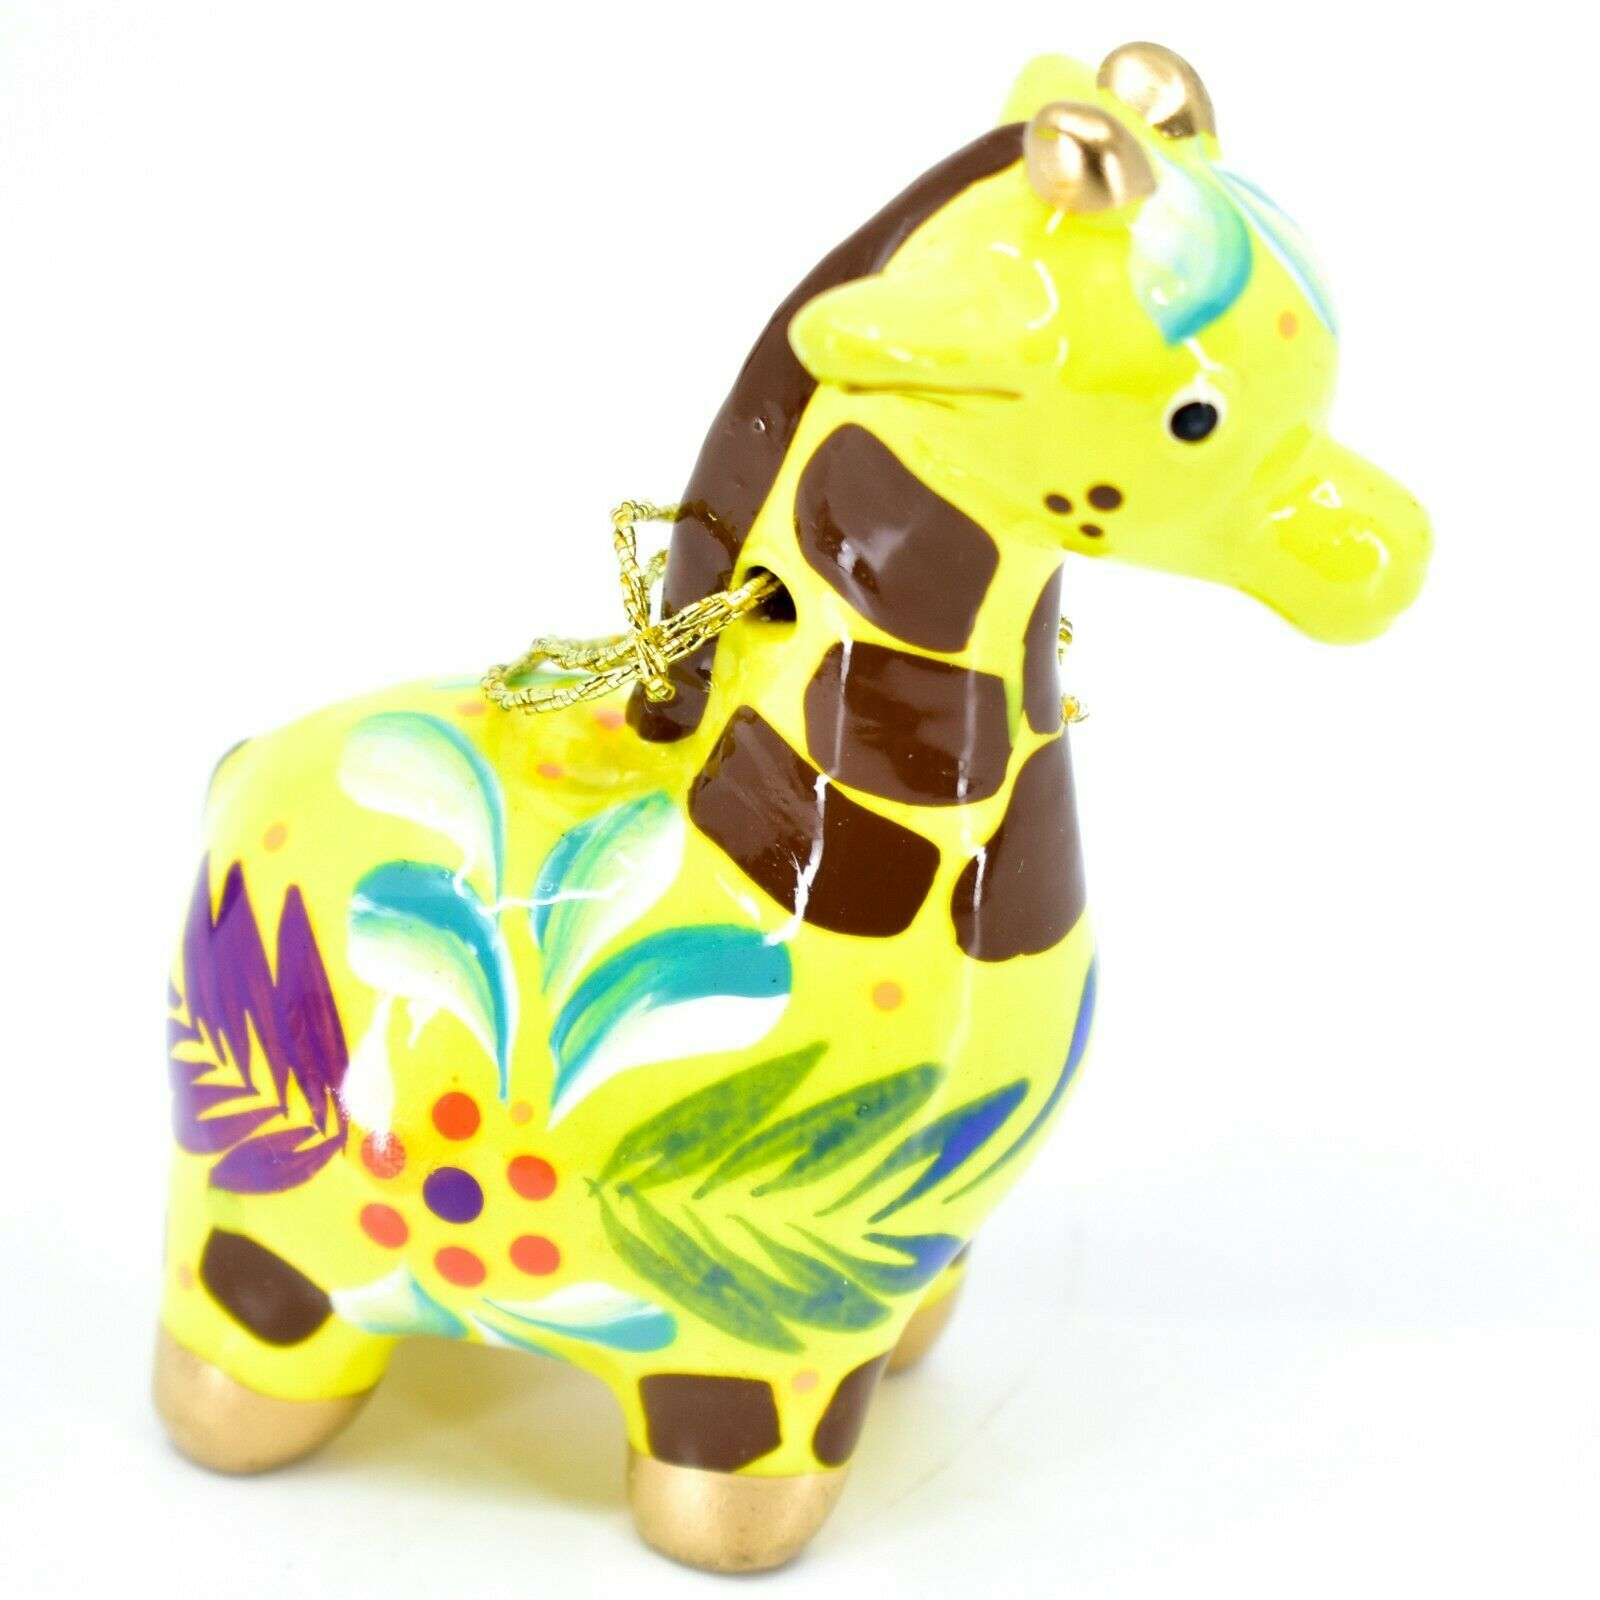 Handcrafted Painted Ceramic Yellow Giraffe Confetti Ornament Made in Peru